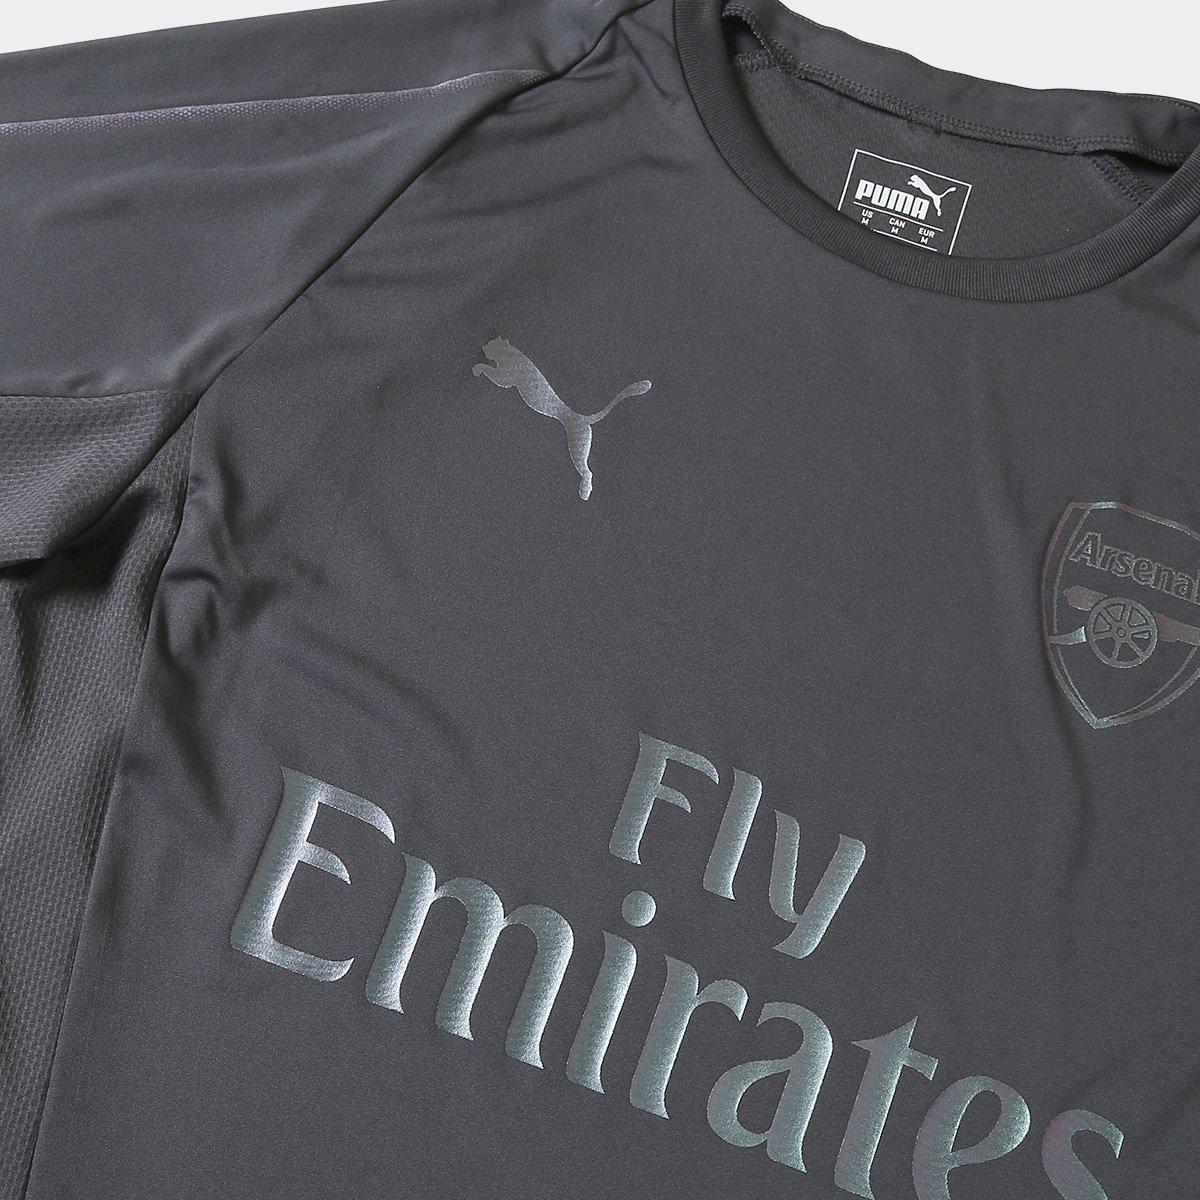 Camisa de Treino Arsenal 18 19 s nº Puma Masculina - Cinza - Compre ... 2eba3eb419758